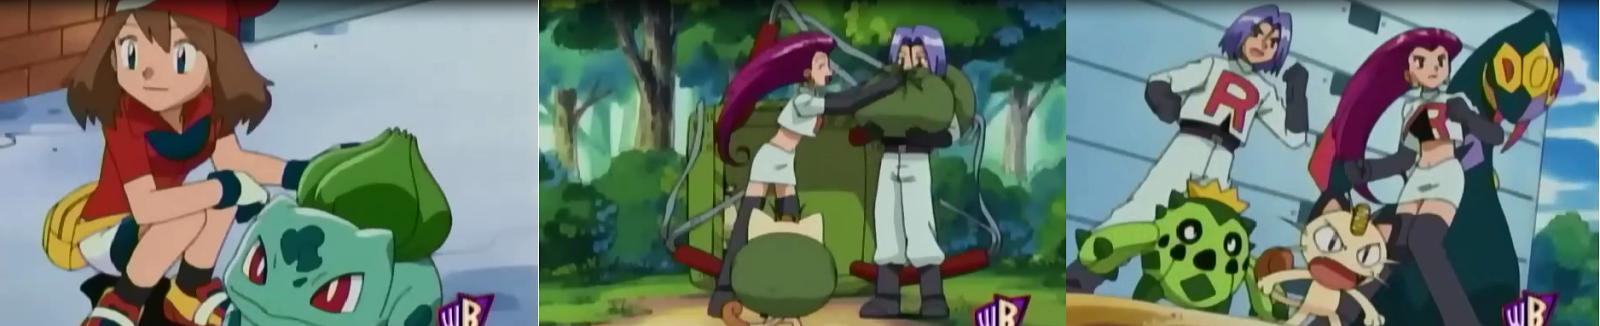 Pokemon Capitulo 34 Temporada 7 Pokébolas Locas